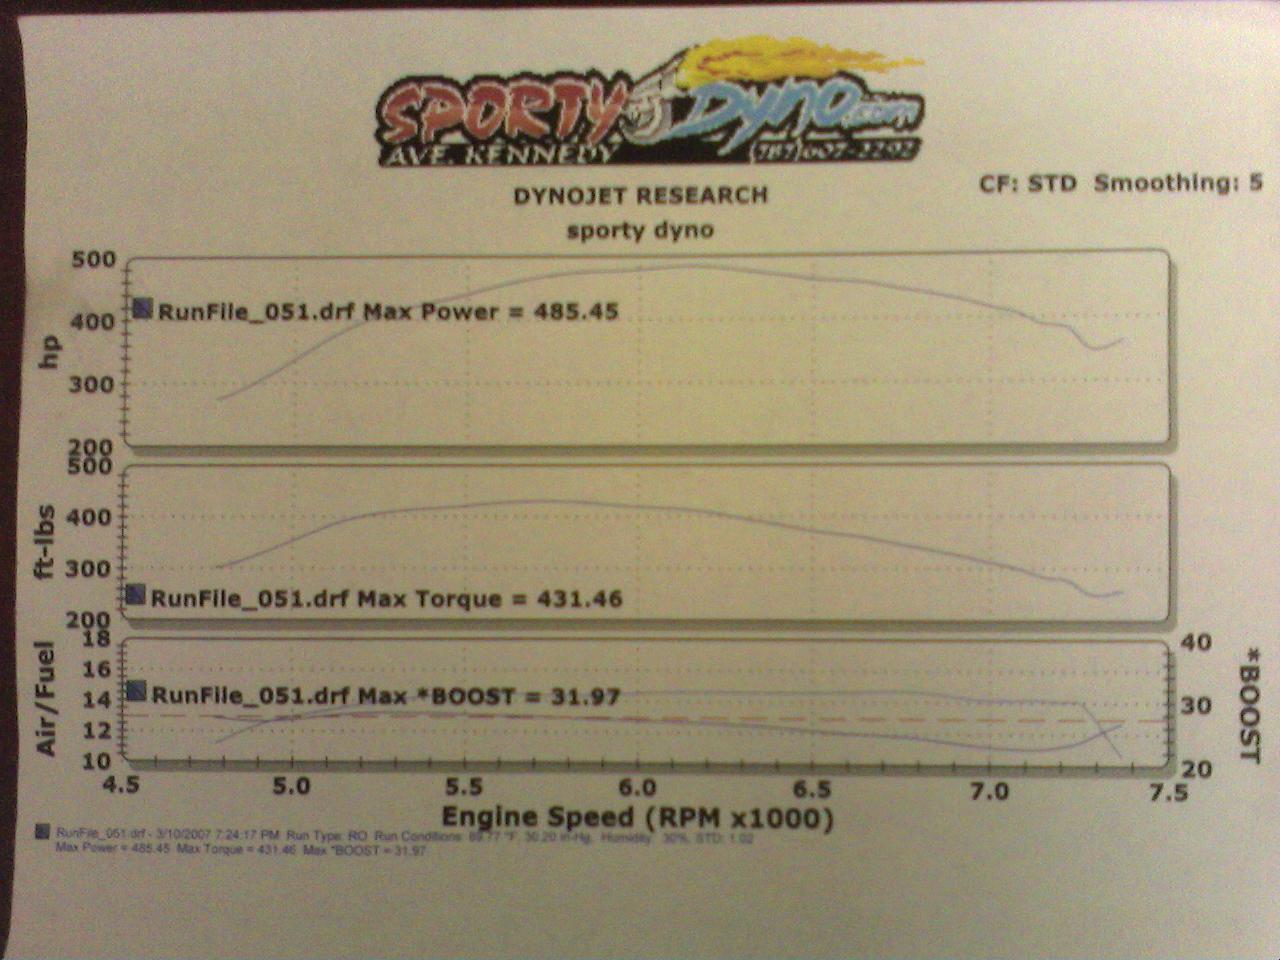 Audi TT Dyno Graph Results